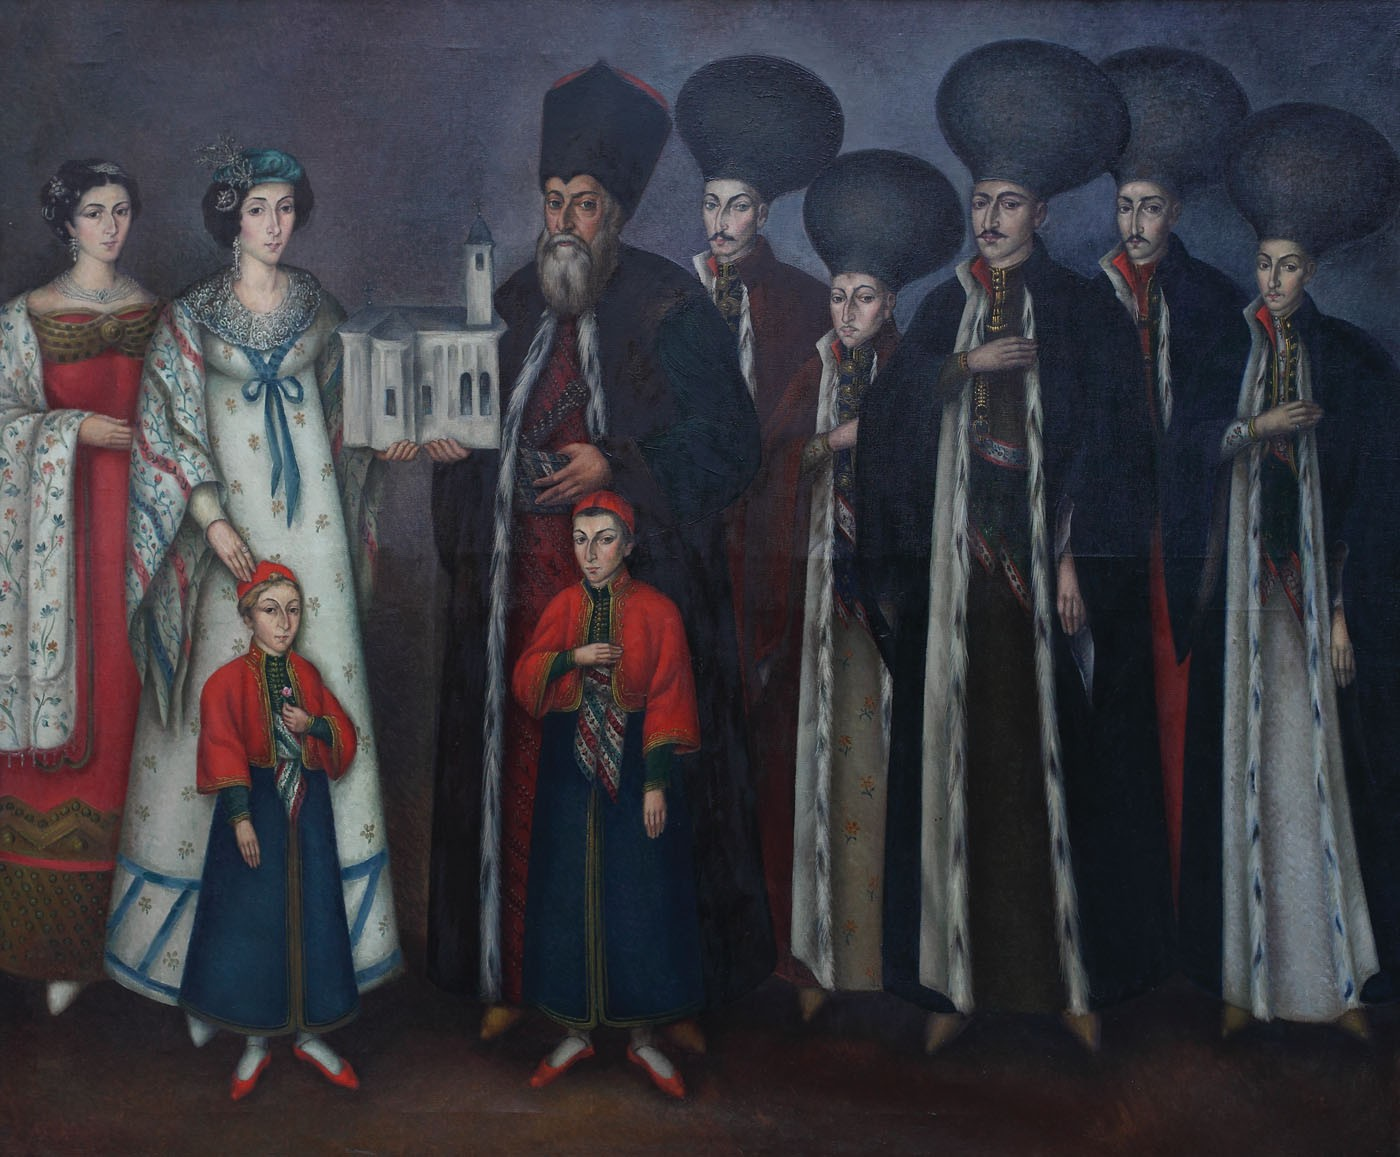 Imagini pentru Gheorghe Popescu, Ctitorii bisericii de la Leordeni, Marele Vornic Mihail George Manu și familia sa